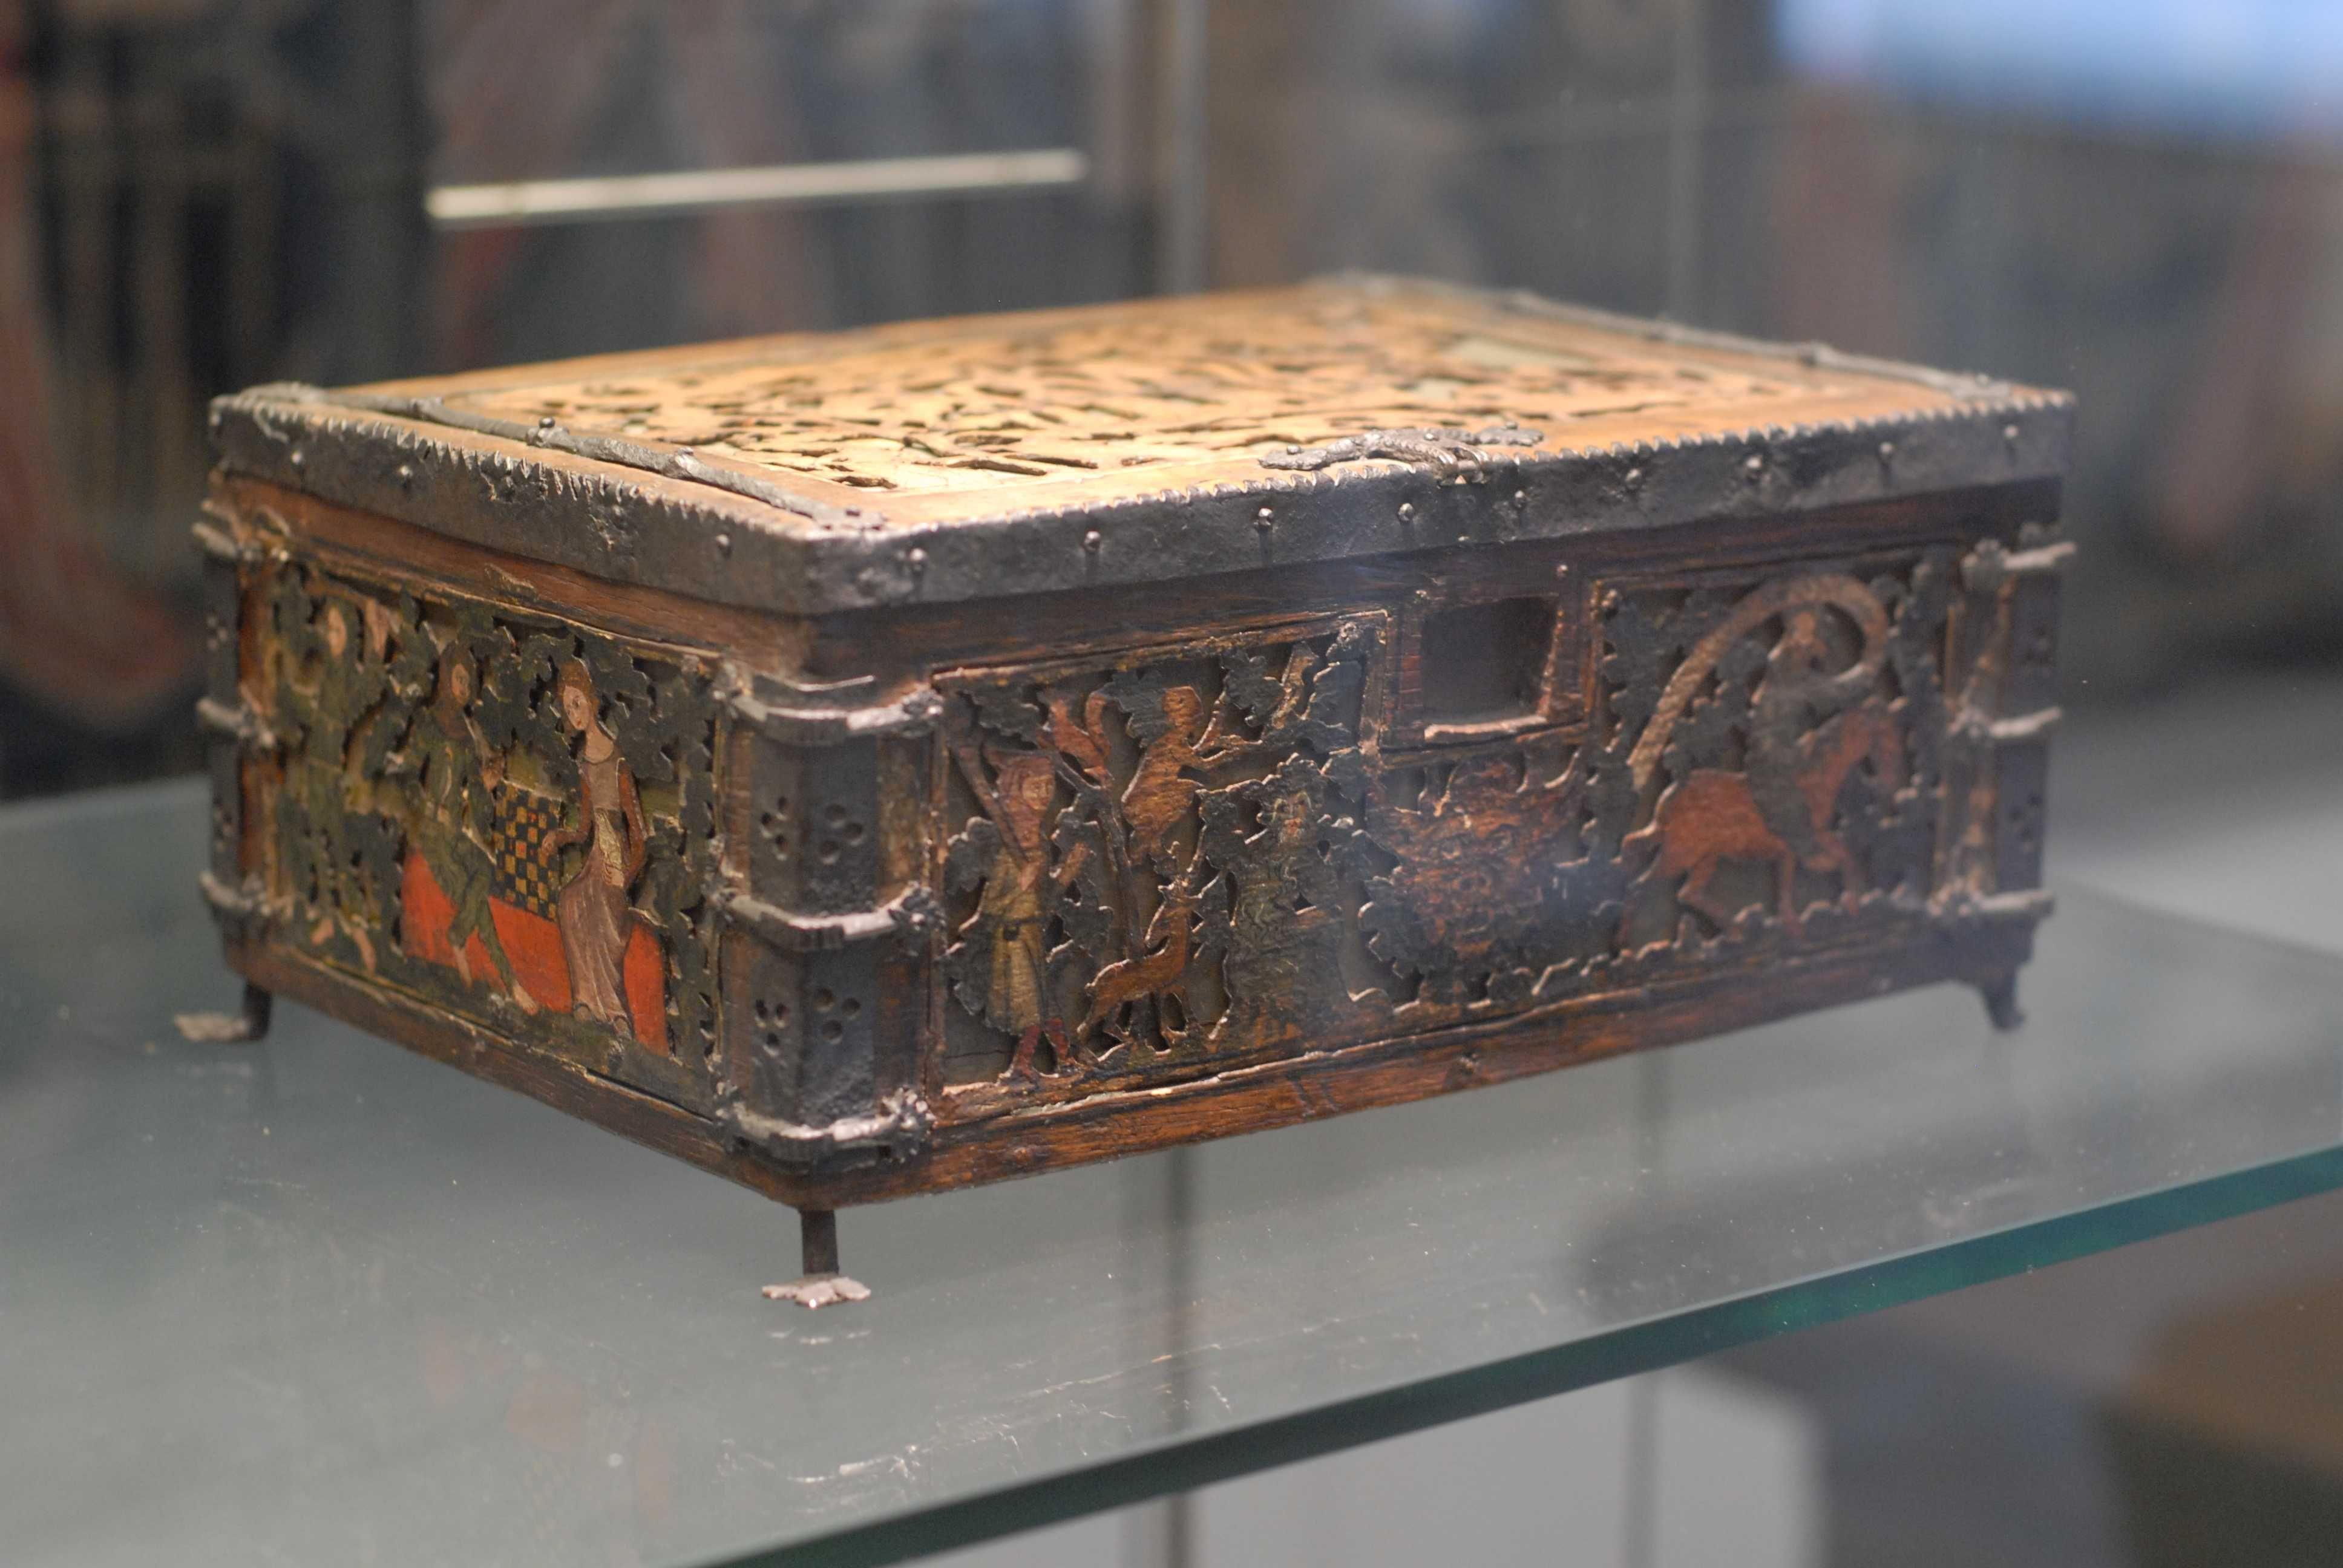 Minnekastchen Museum Fur Angewandte Kunst Koln Keepsake Boxes Antique Collection Decorative Boxes